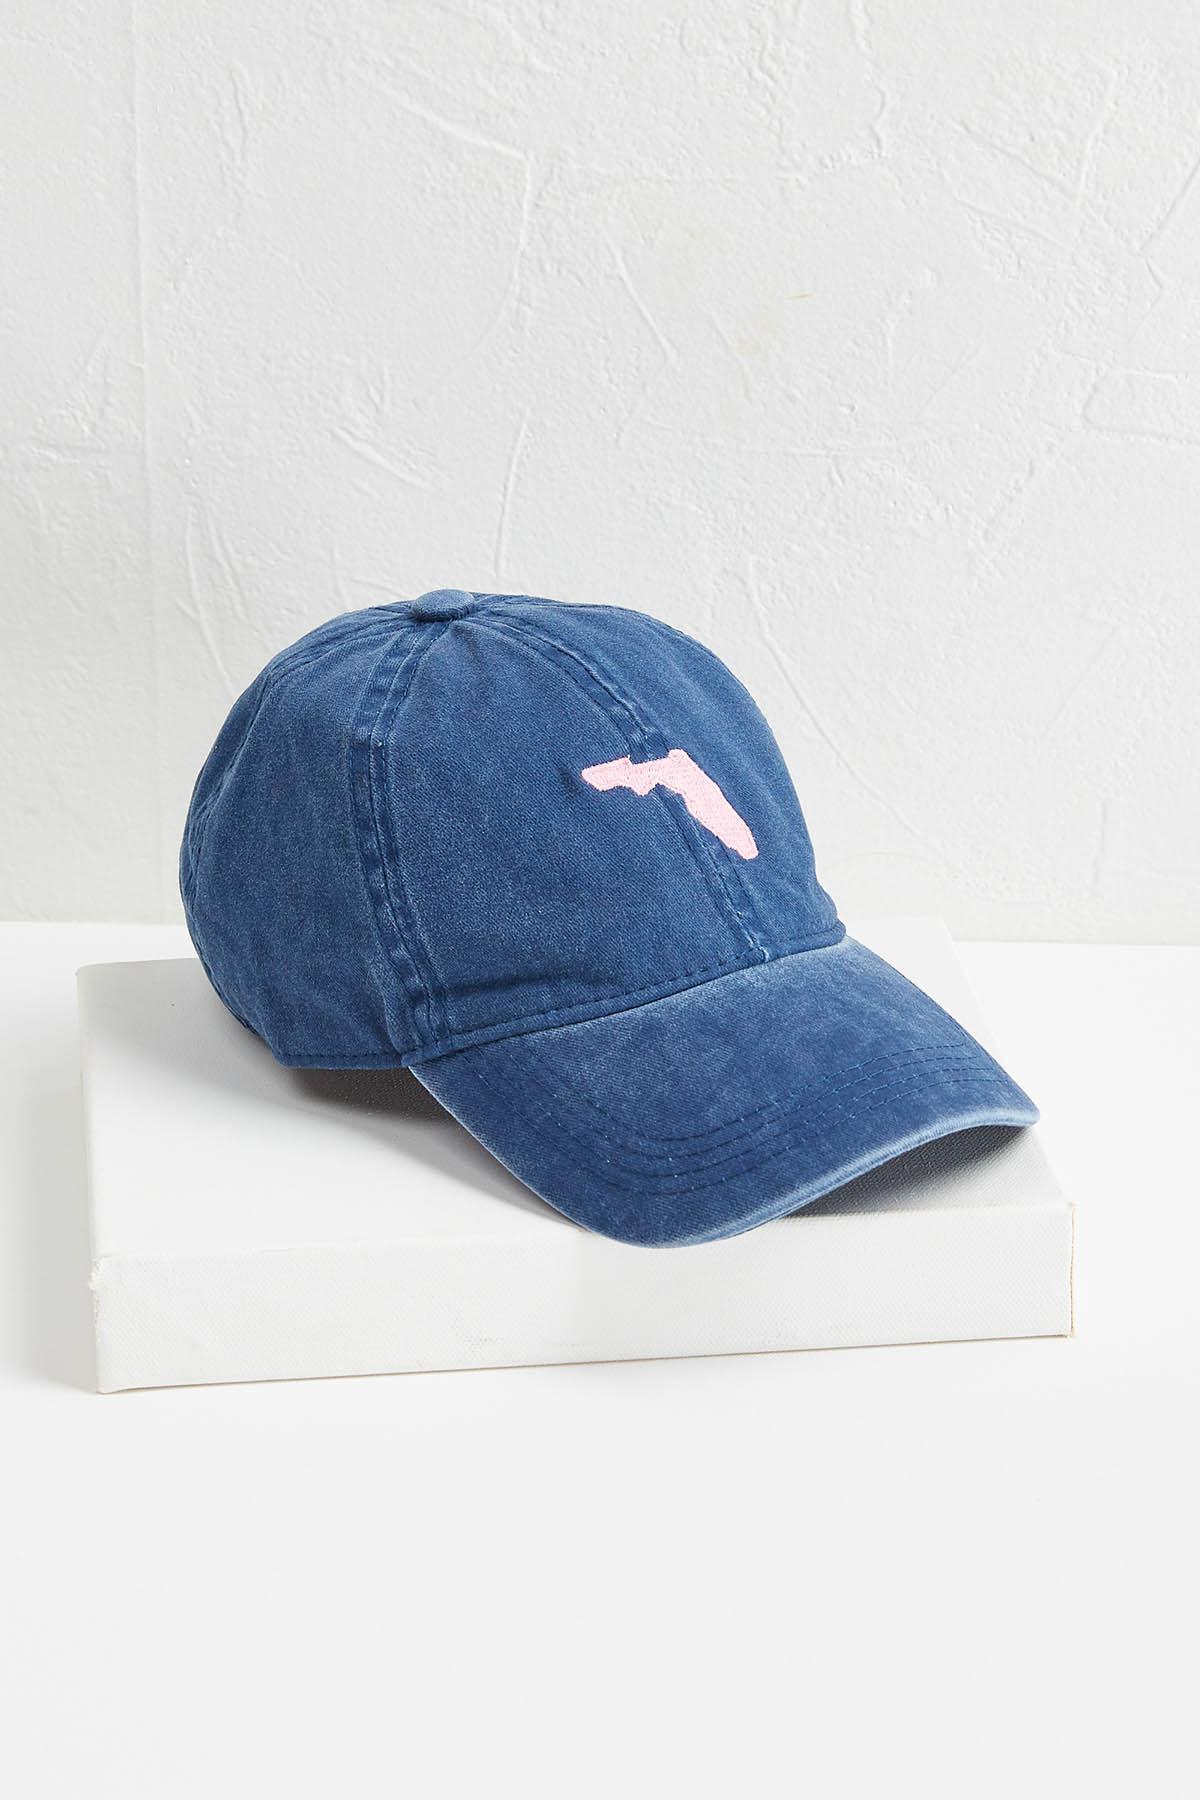 Florida Baseball Hat